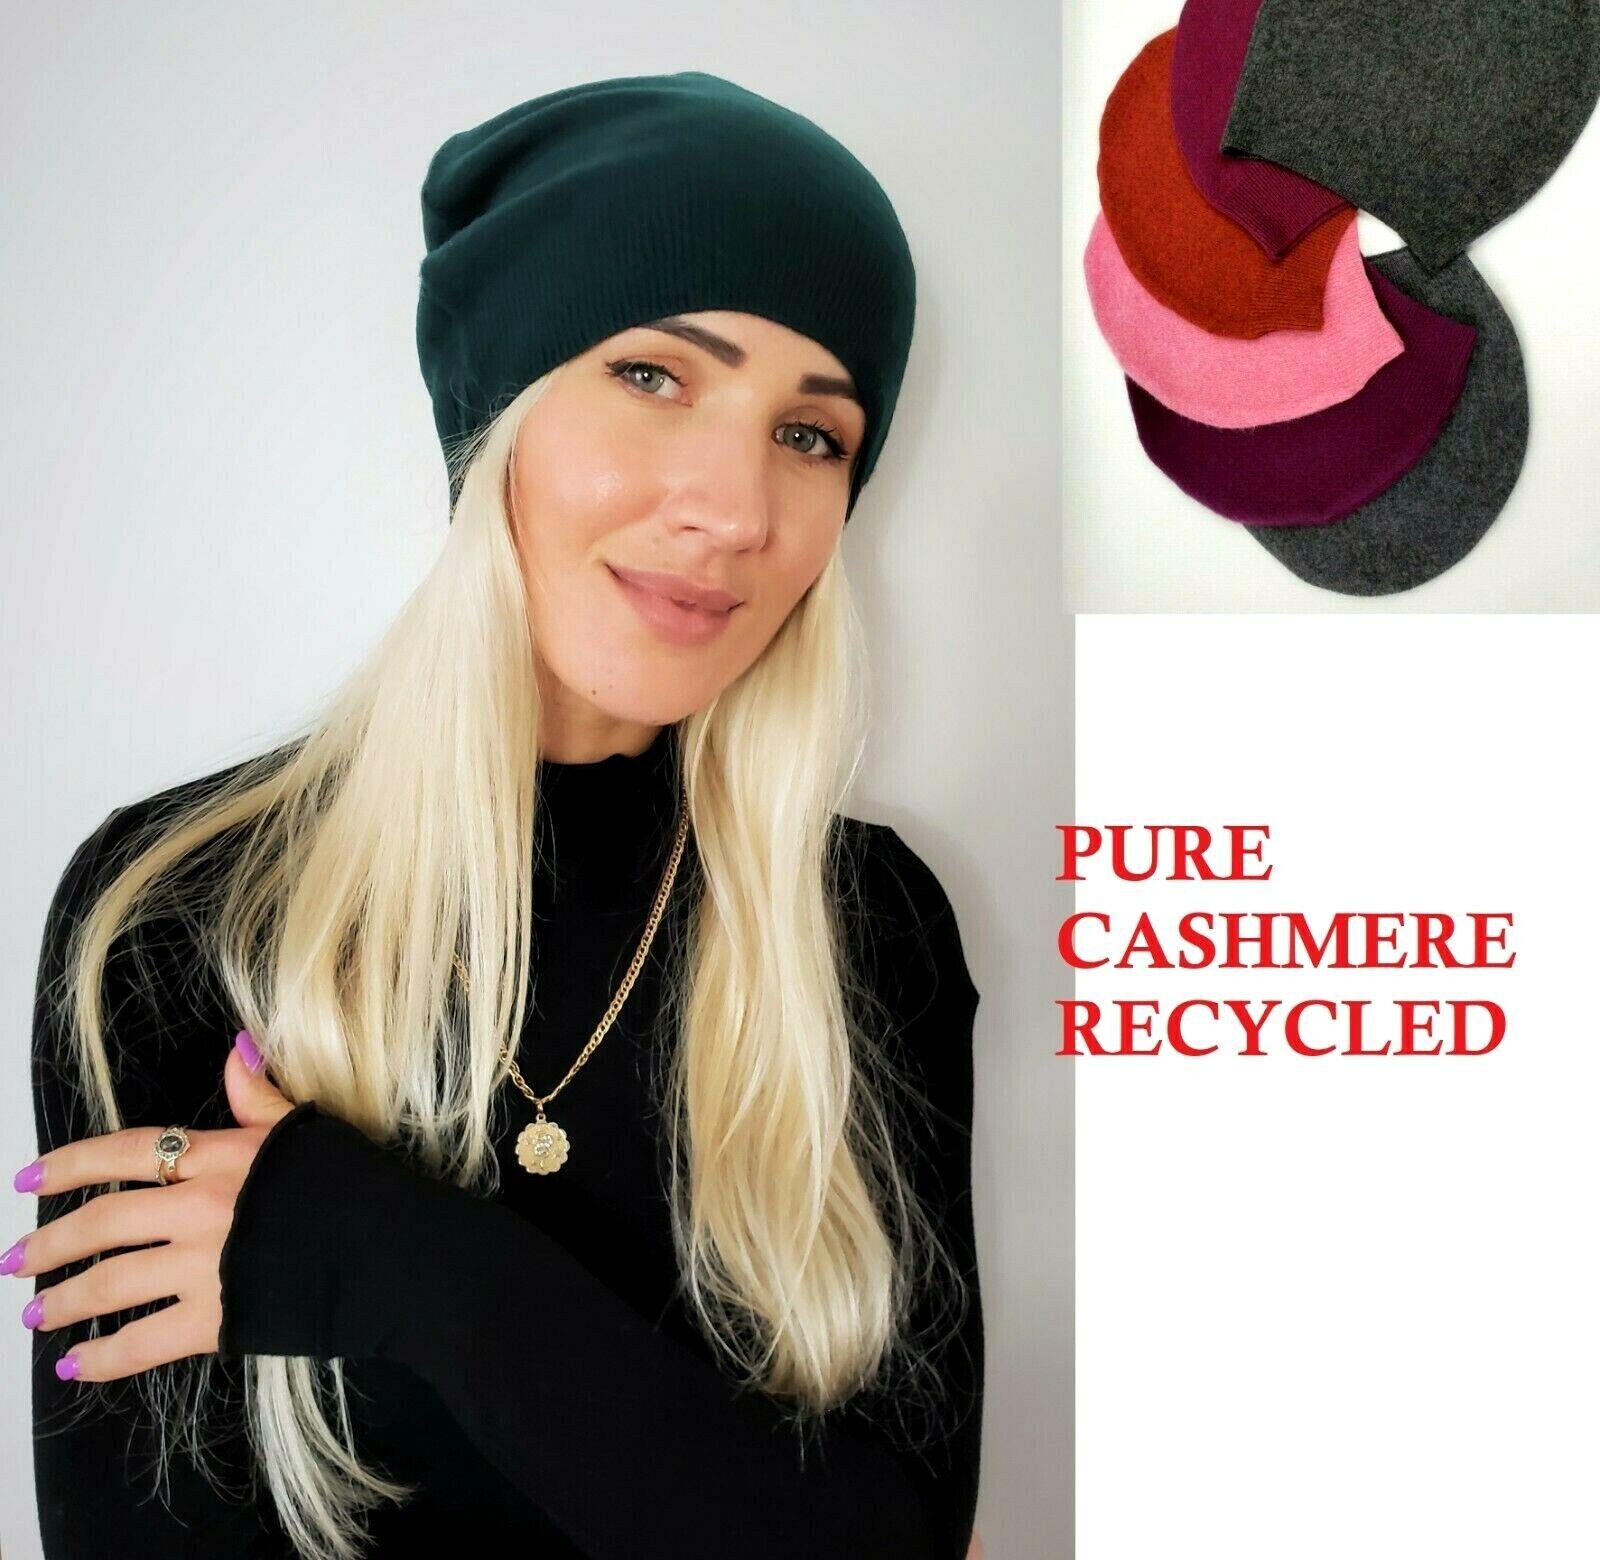 # 100% Pure Cashmere Sombrero Gorro de Lana Hombre Mujer Unisex Hecho a Mano A003